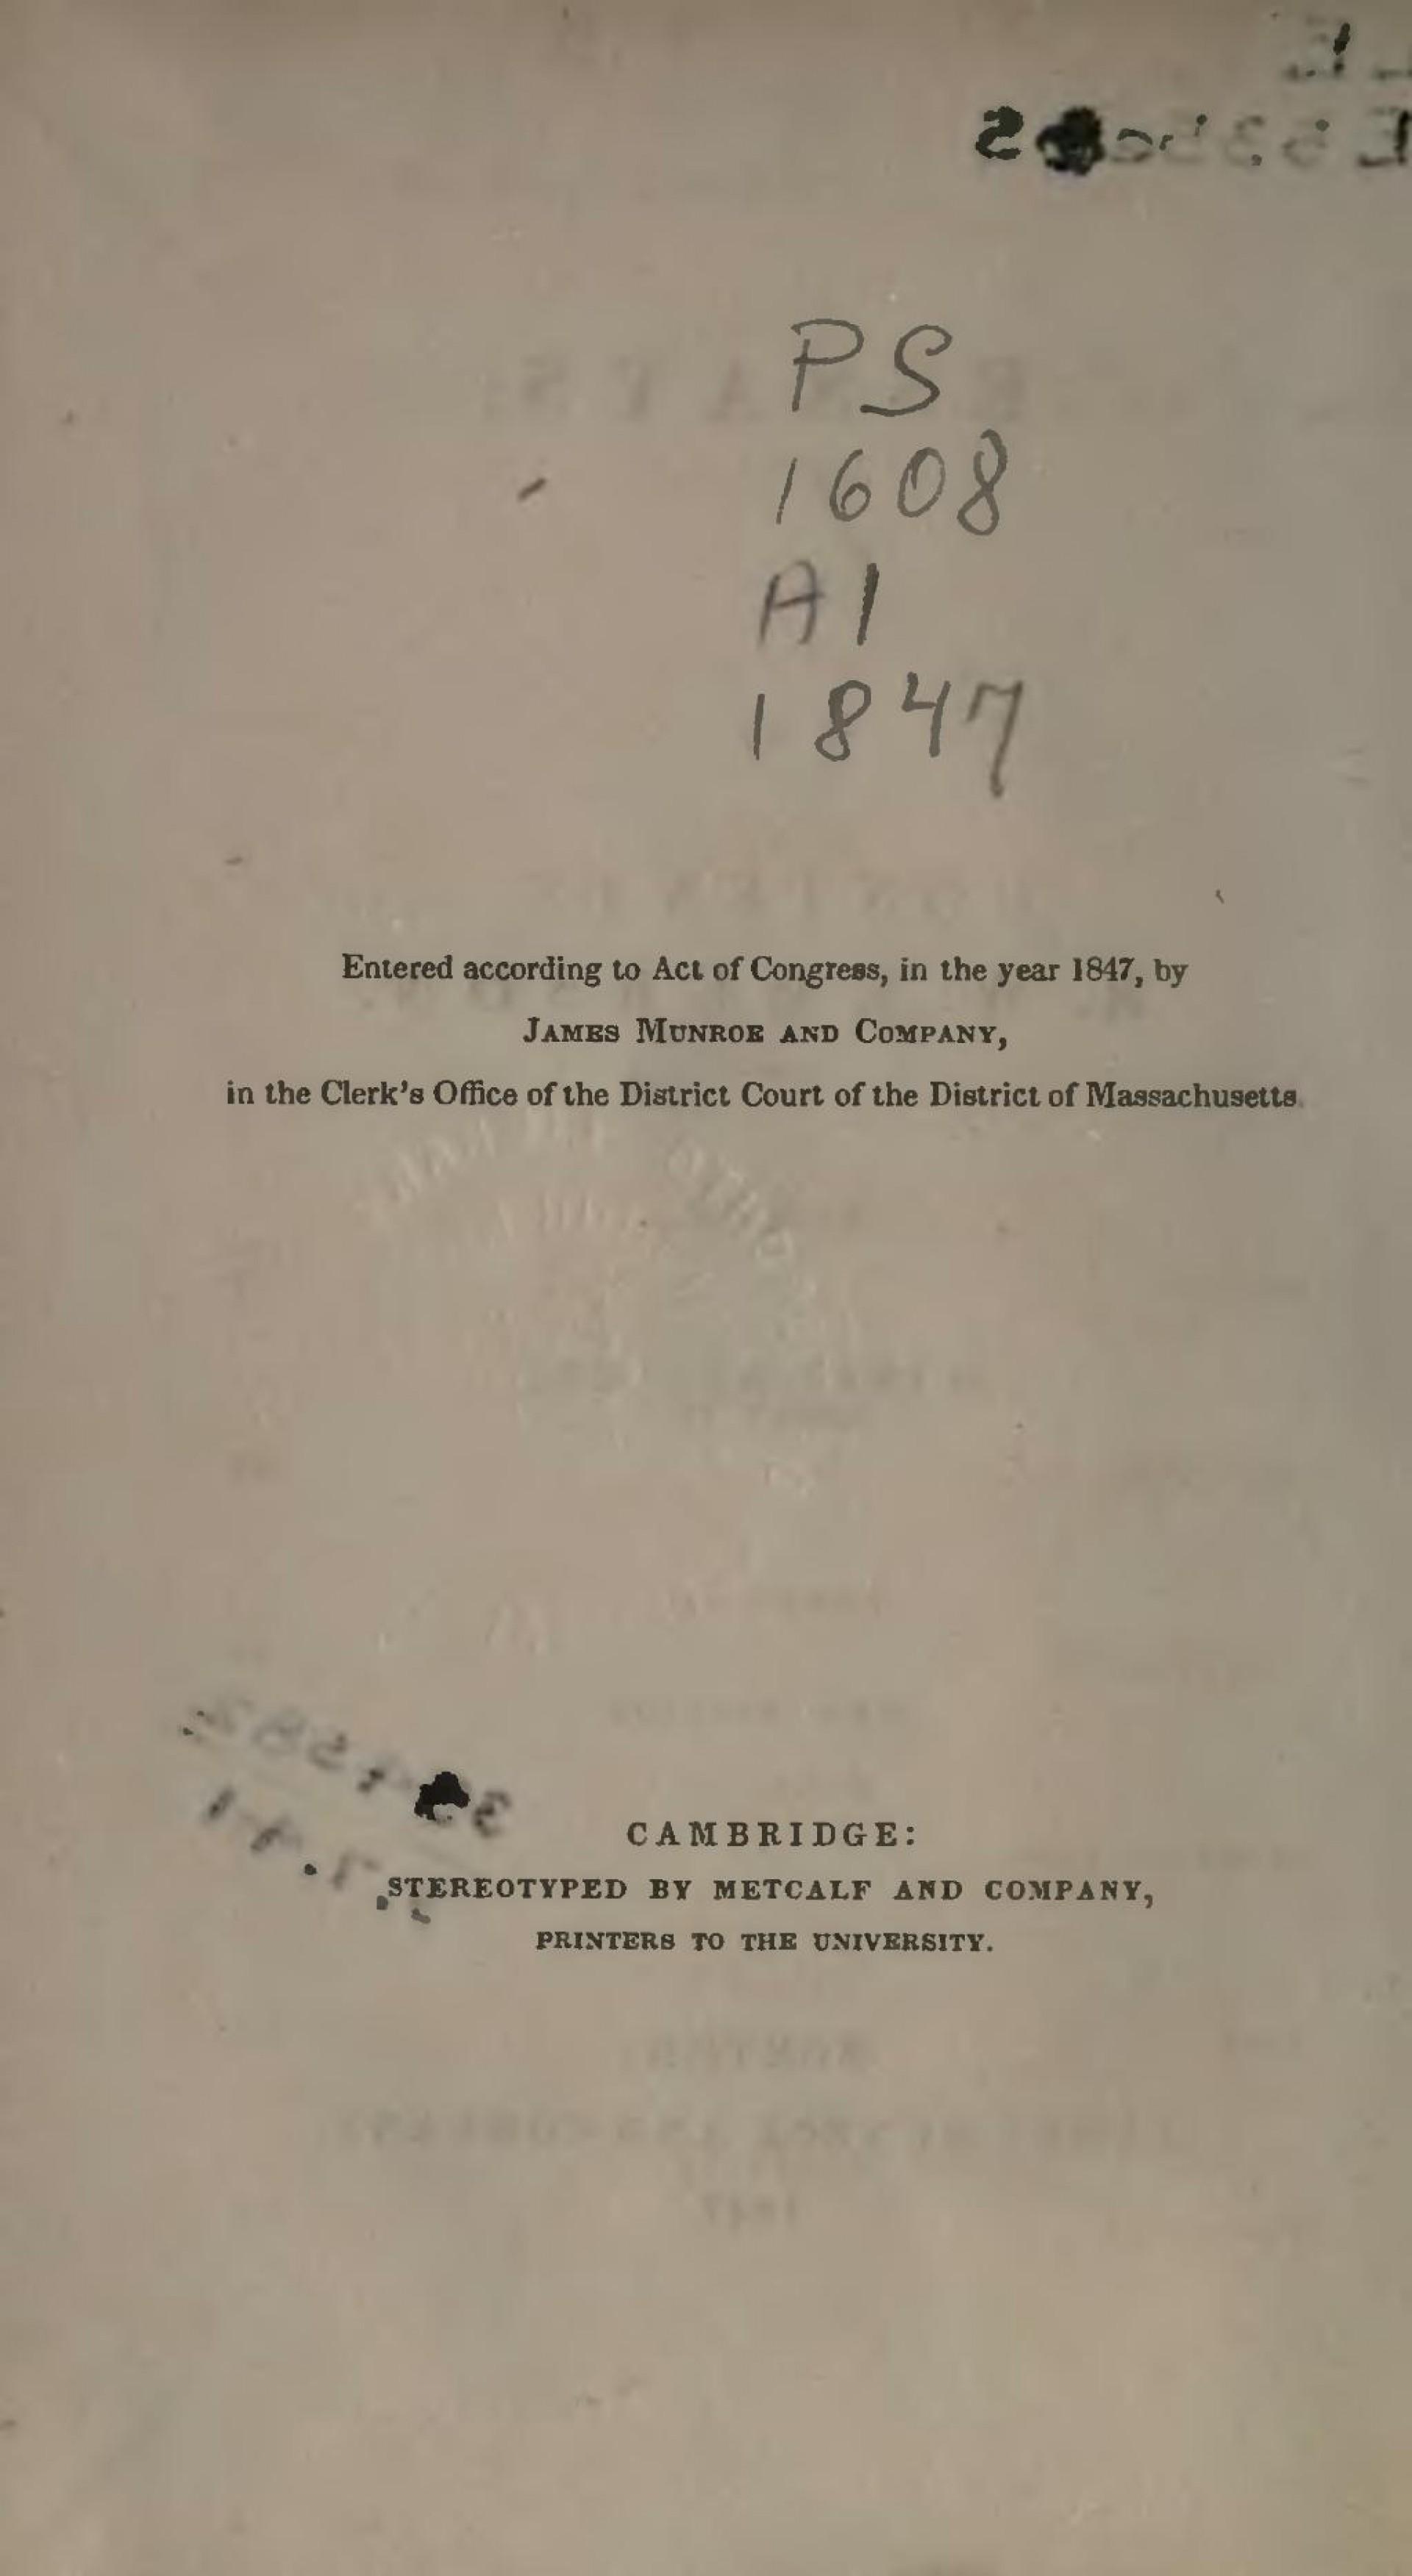 014 Essays First Series Page10 1024px Essays2c 28184729 Djvu Essay Stunning Emerson Pdf Shelburne Publisher 1920